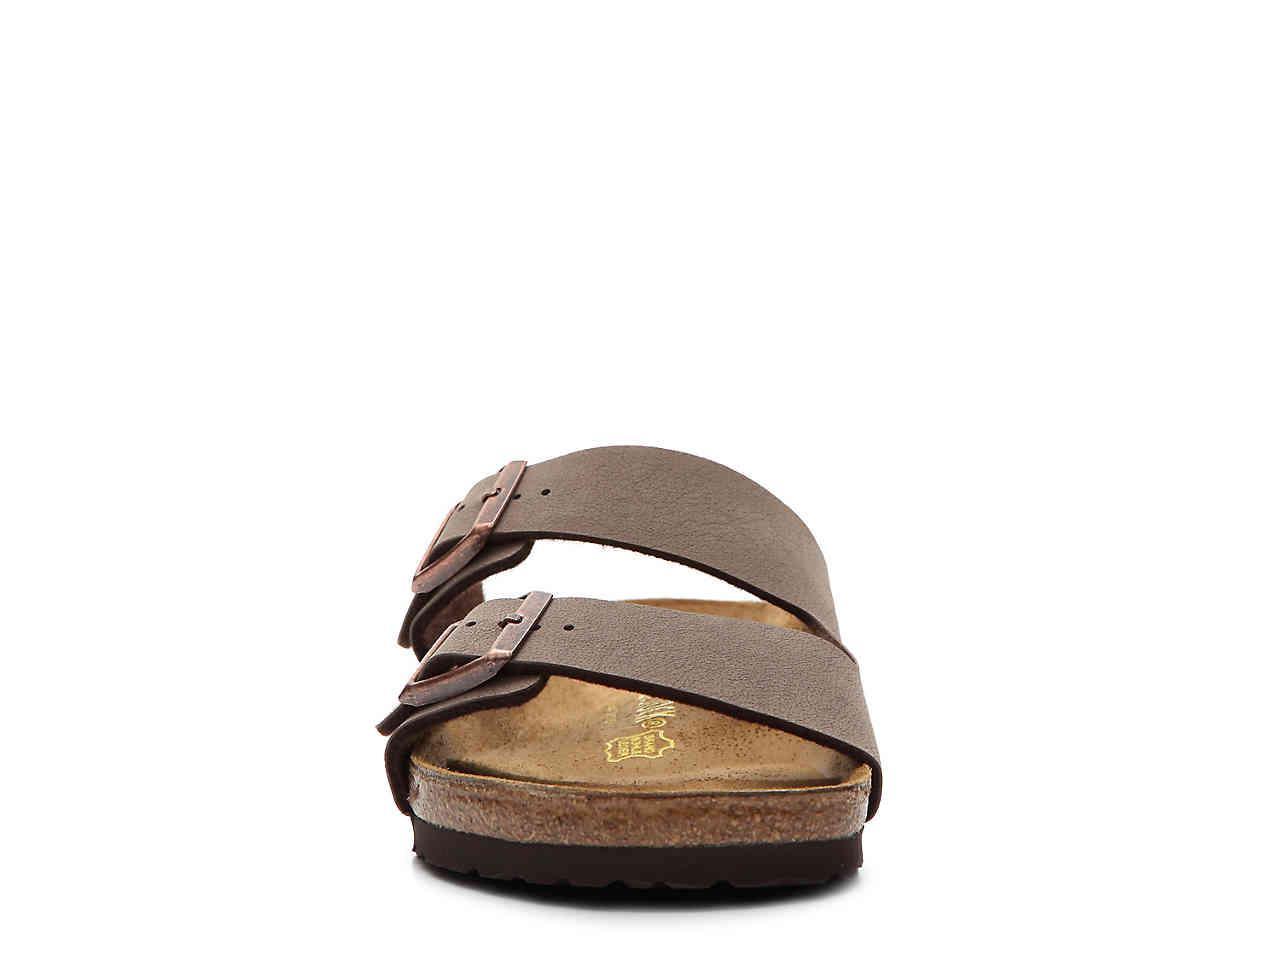 a807d9cfaa Birkenstock - Brown Arizona Birko-flor Slide Sandal for Men - Lyst. View  fullscreen